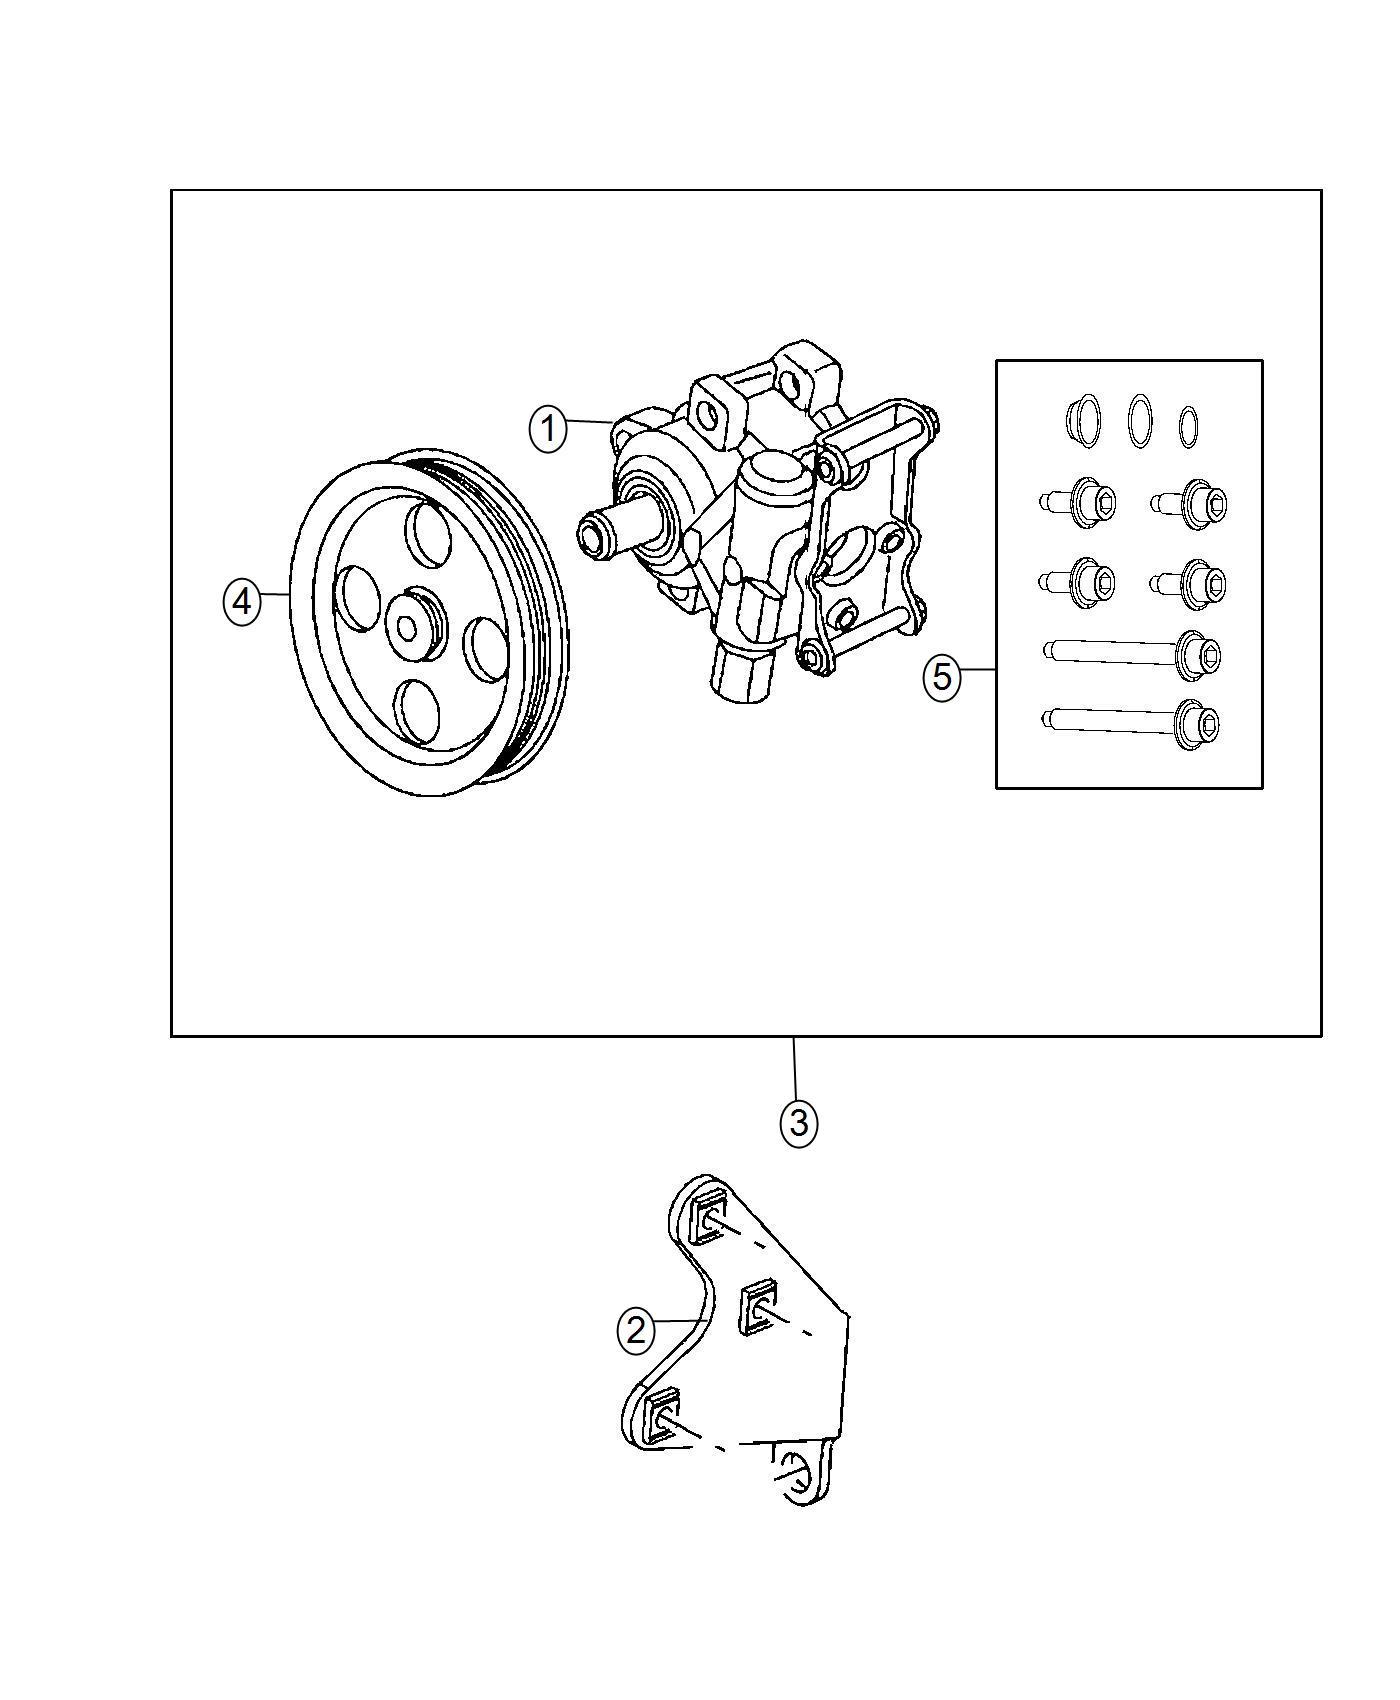 2009 Dodge Ram 1500 Bracket. Power steering pump. [5.7l v8